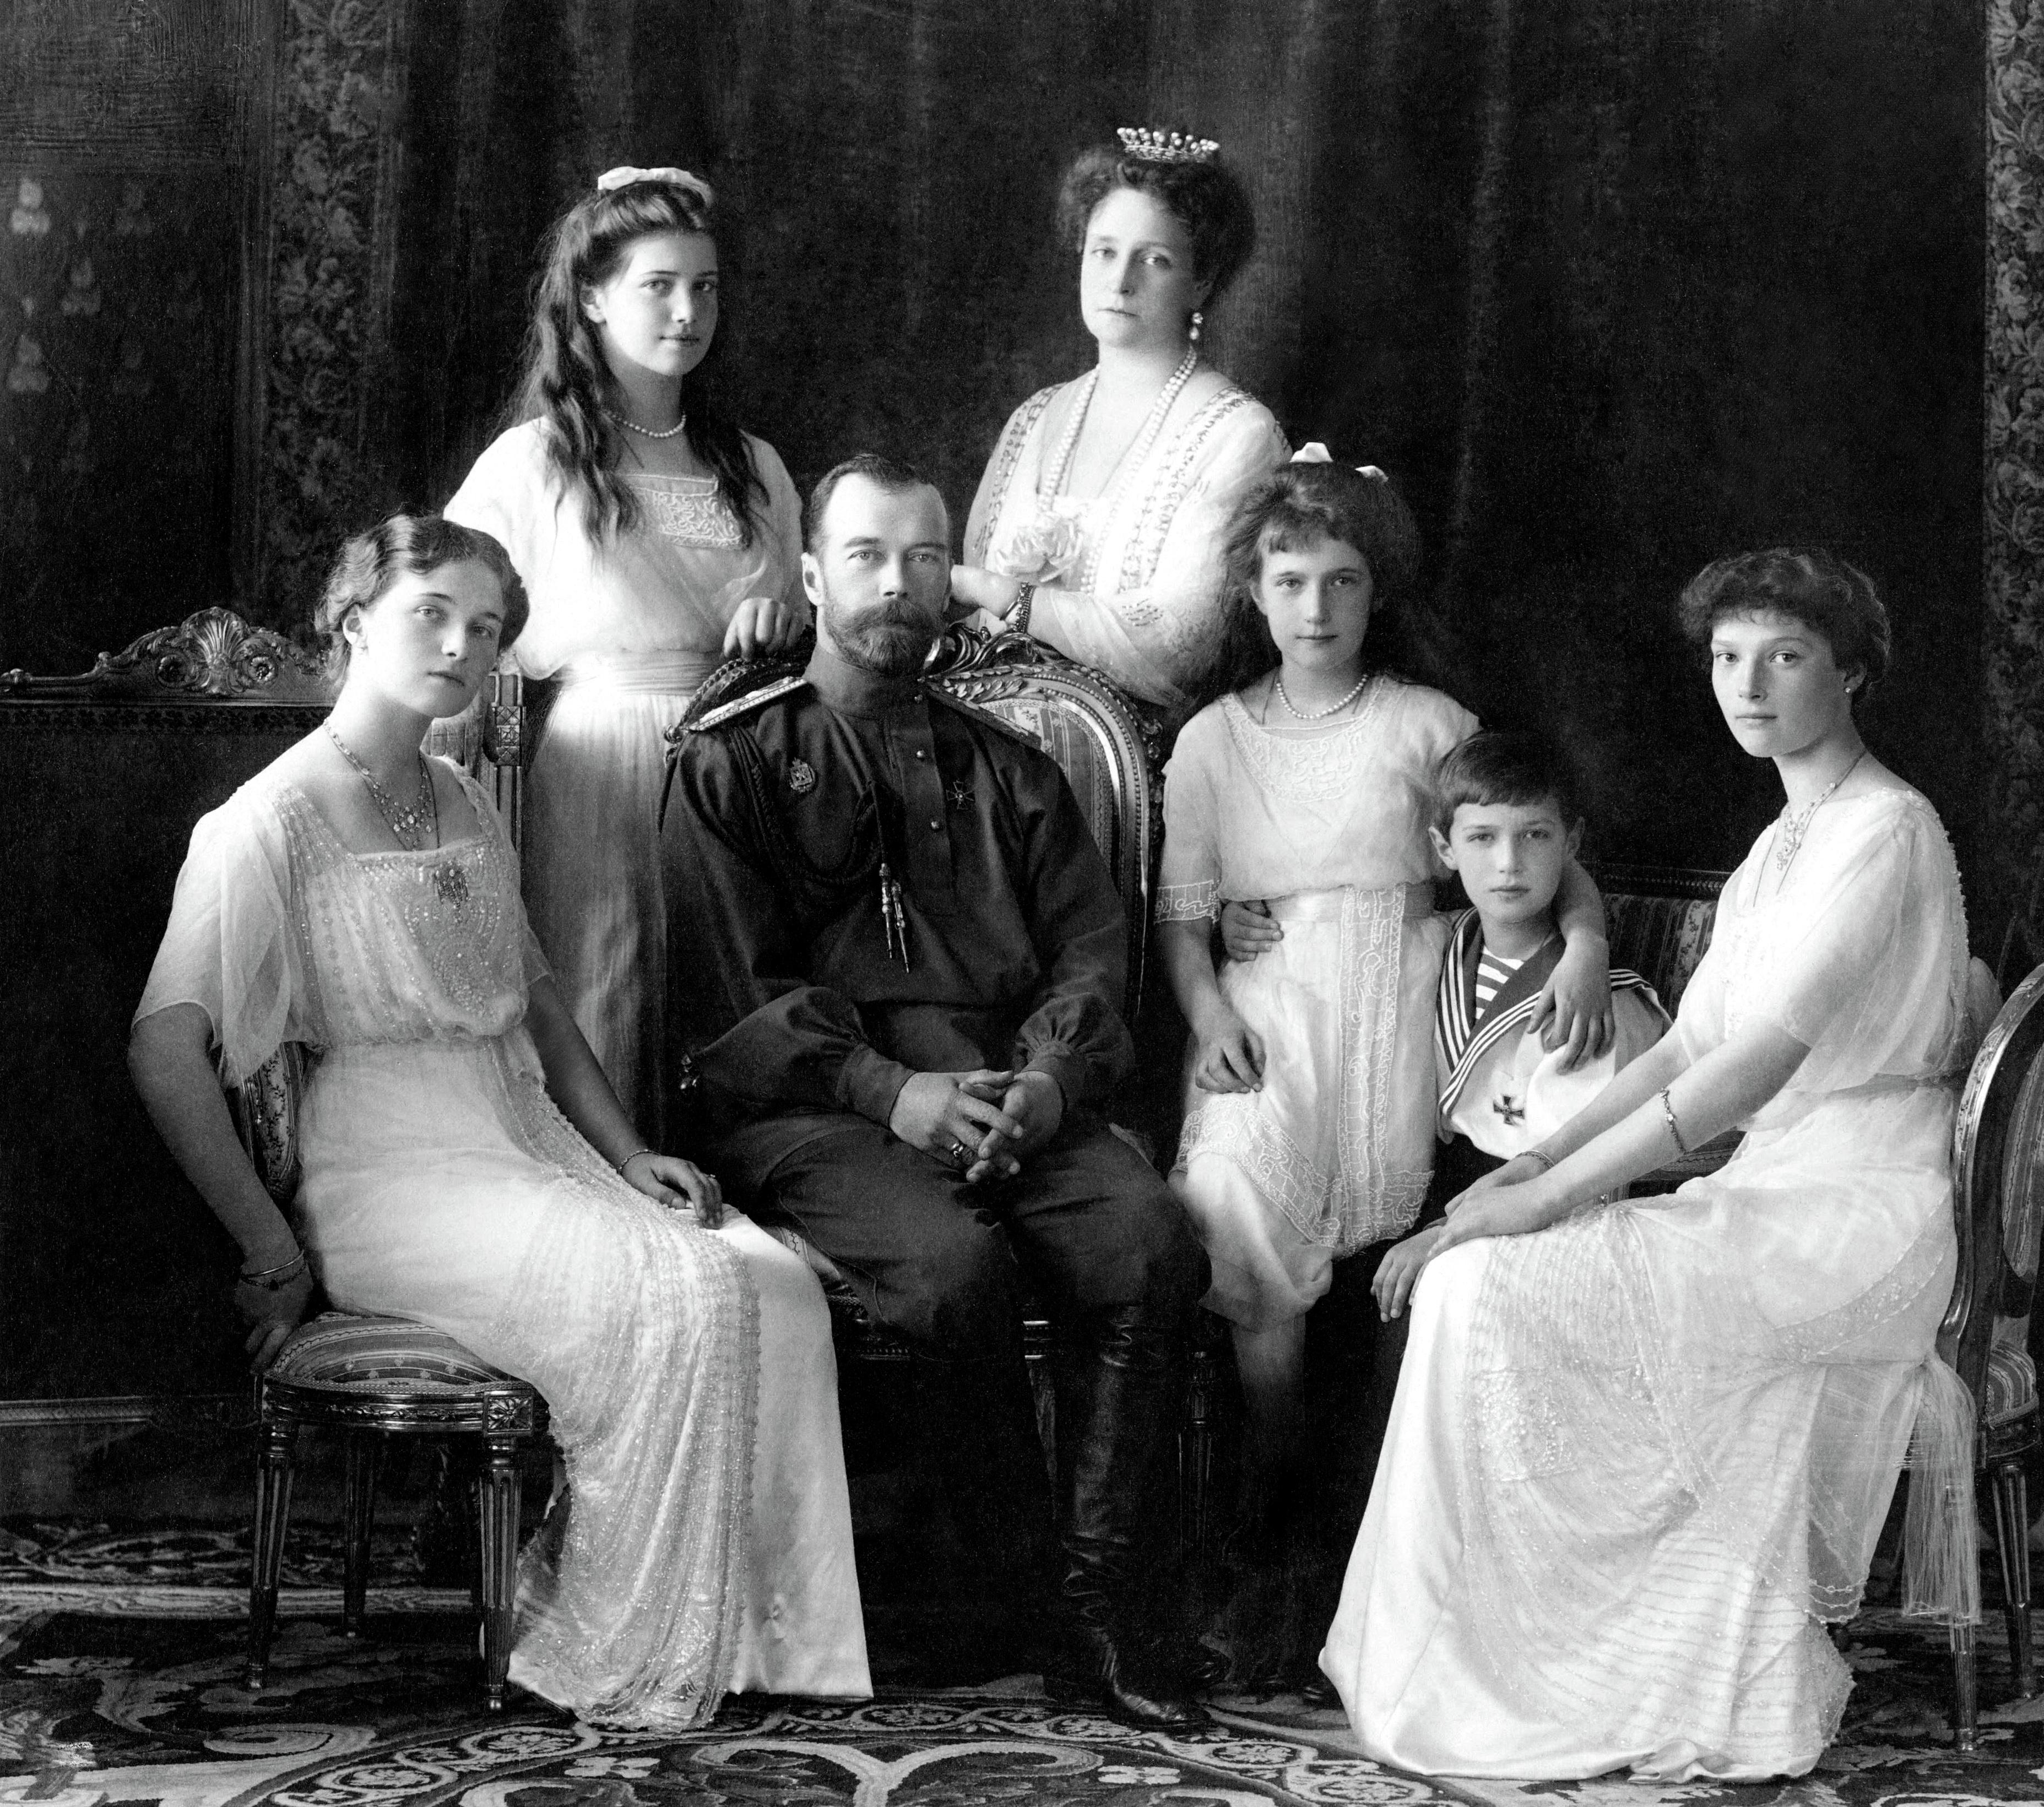 ROMANOV FAMILY (1913 PIC., MURDERED 1918, LEFT TO RIGHT-OLGA, MARIA, NICHOLAS II, ALEXANDRA, ANASTASIS, ALEXEI, AND TATIANA)